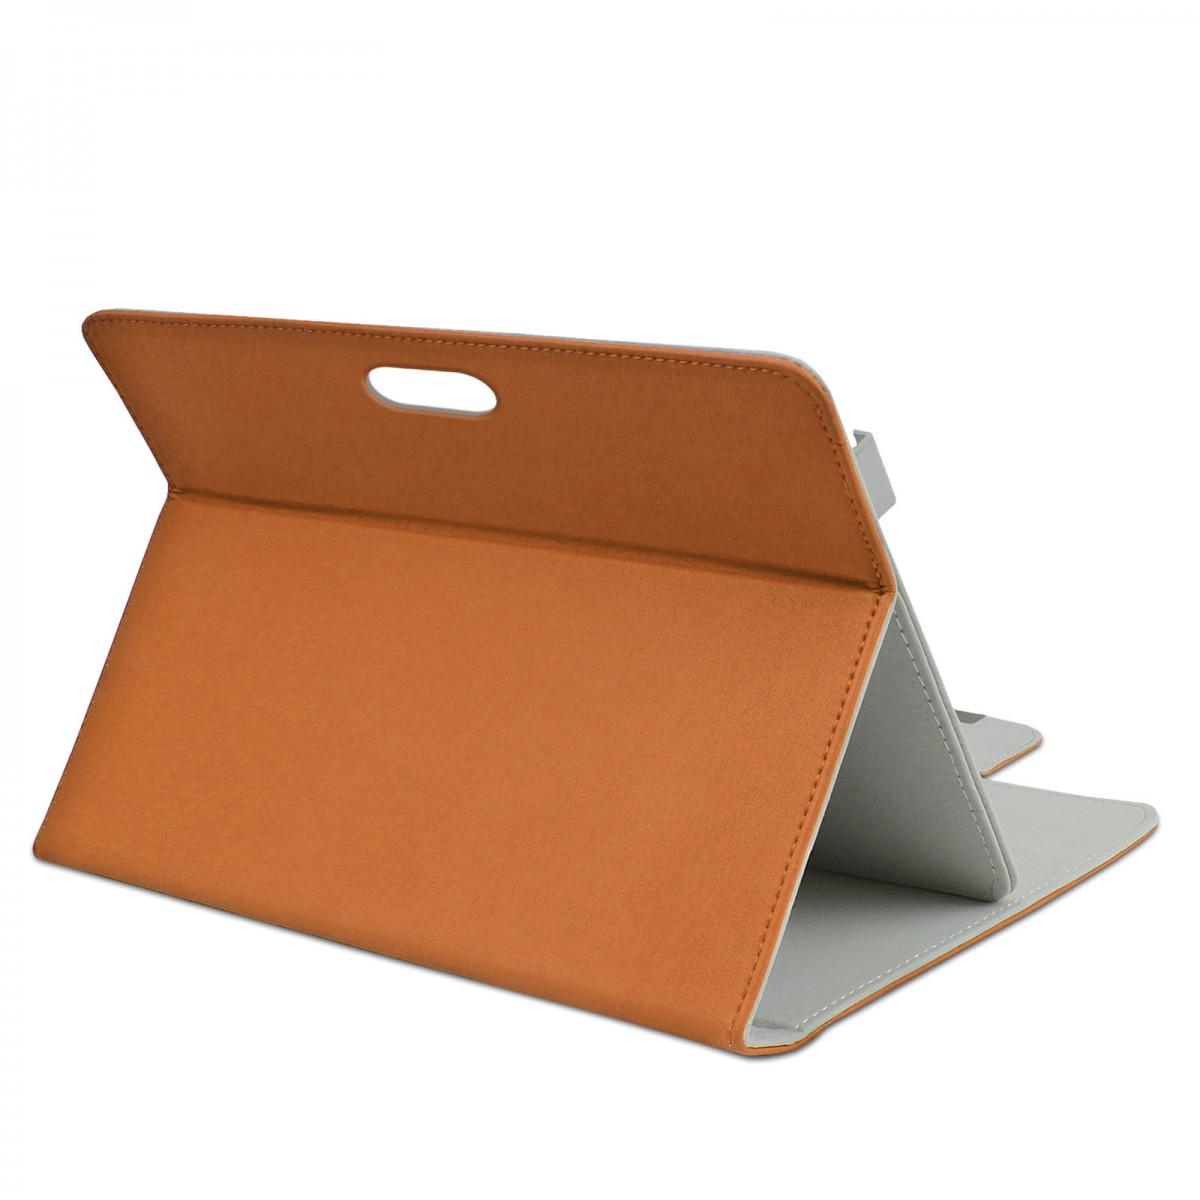 efabrik schutzh lle f r lg g pad 7 0 tasche braun 7 zoll. Black Bedroom Furniture Sets. Home Design Ideas